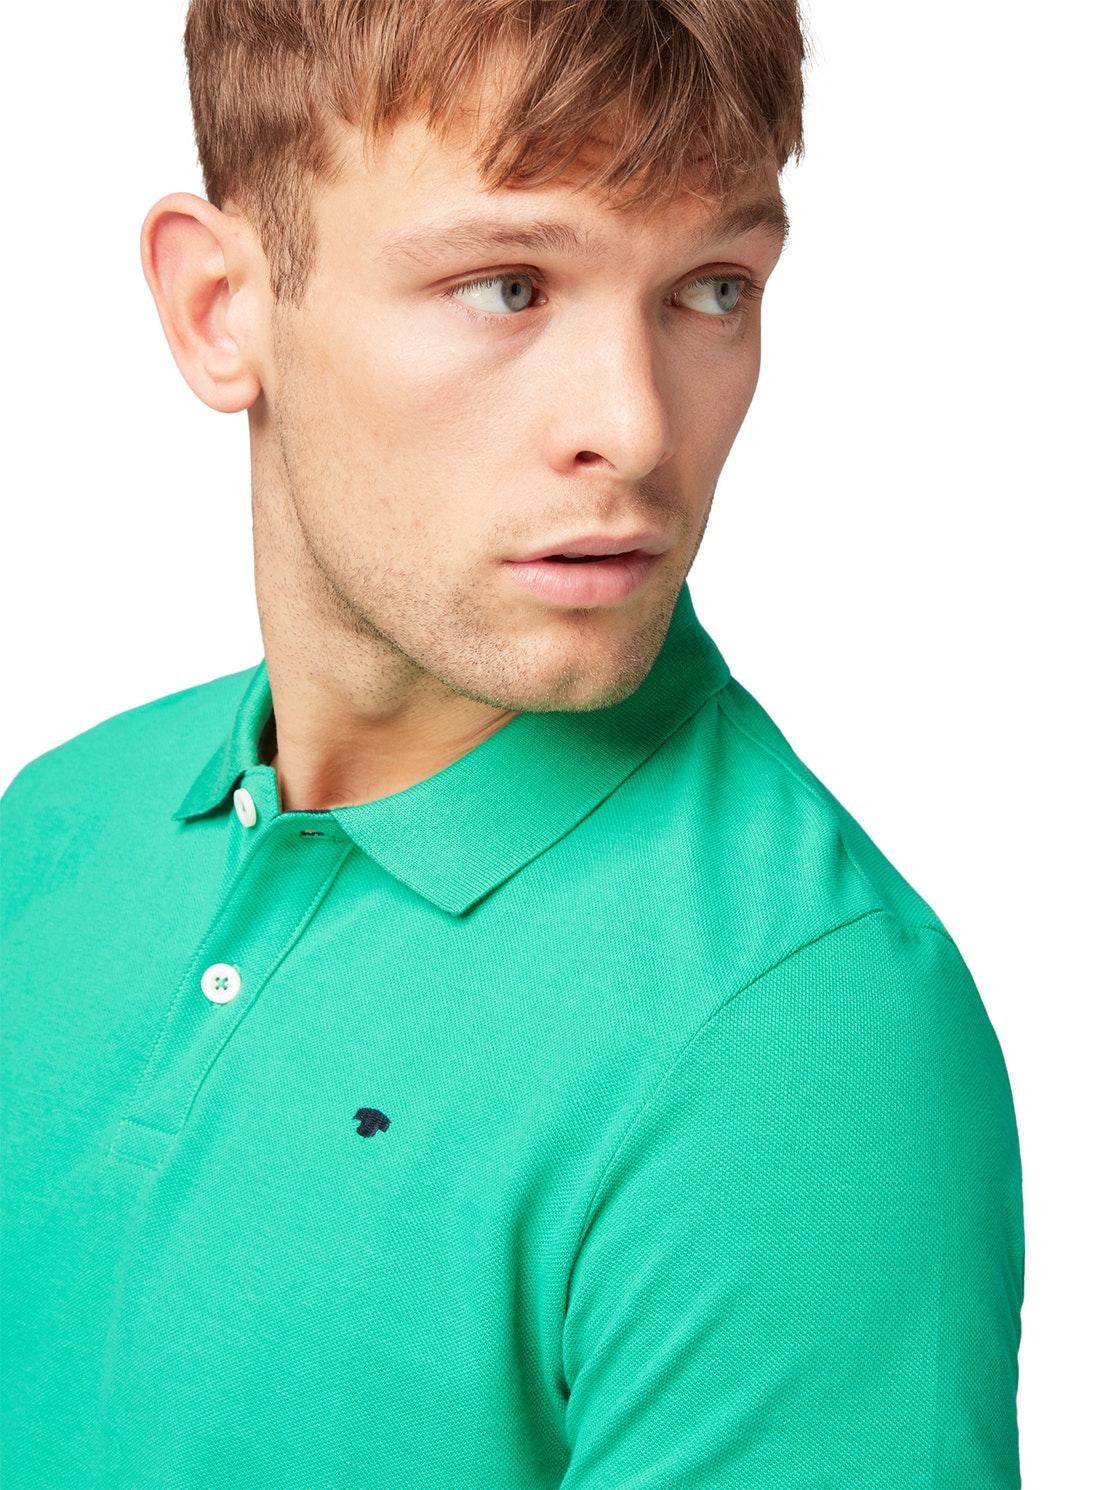 basic polo, cucmber green                 Green